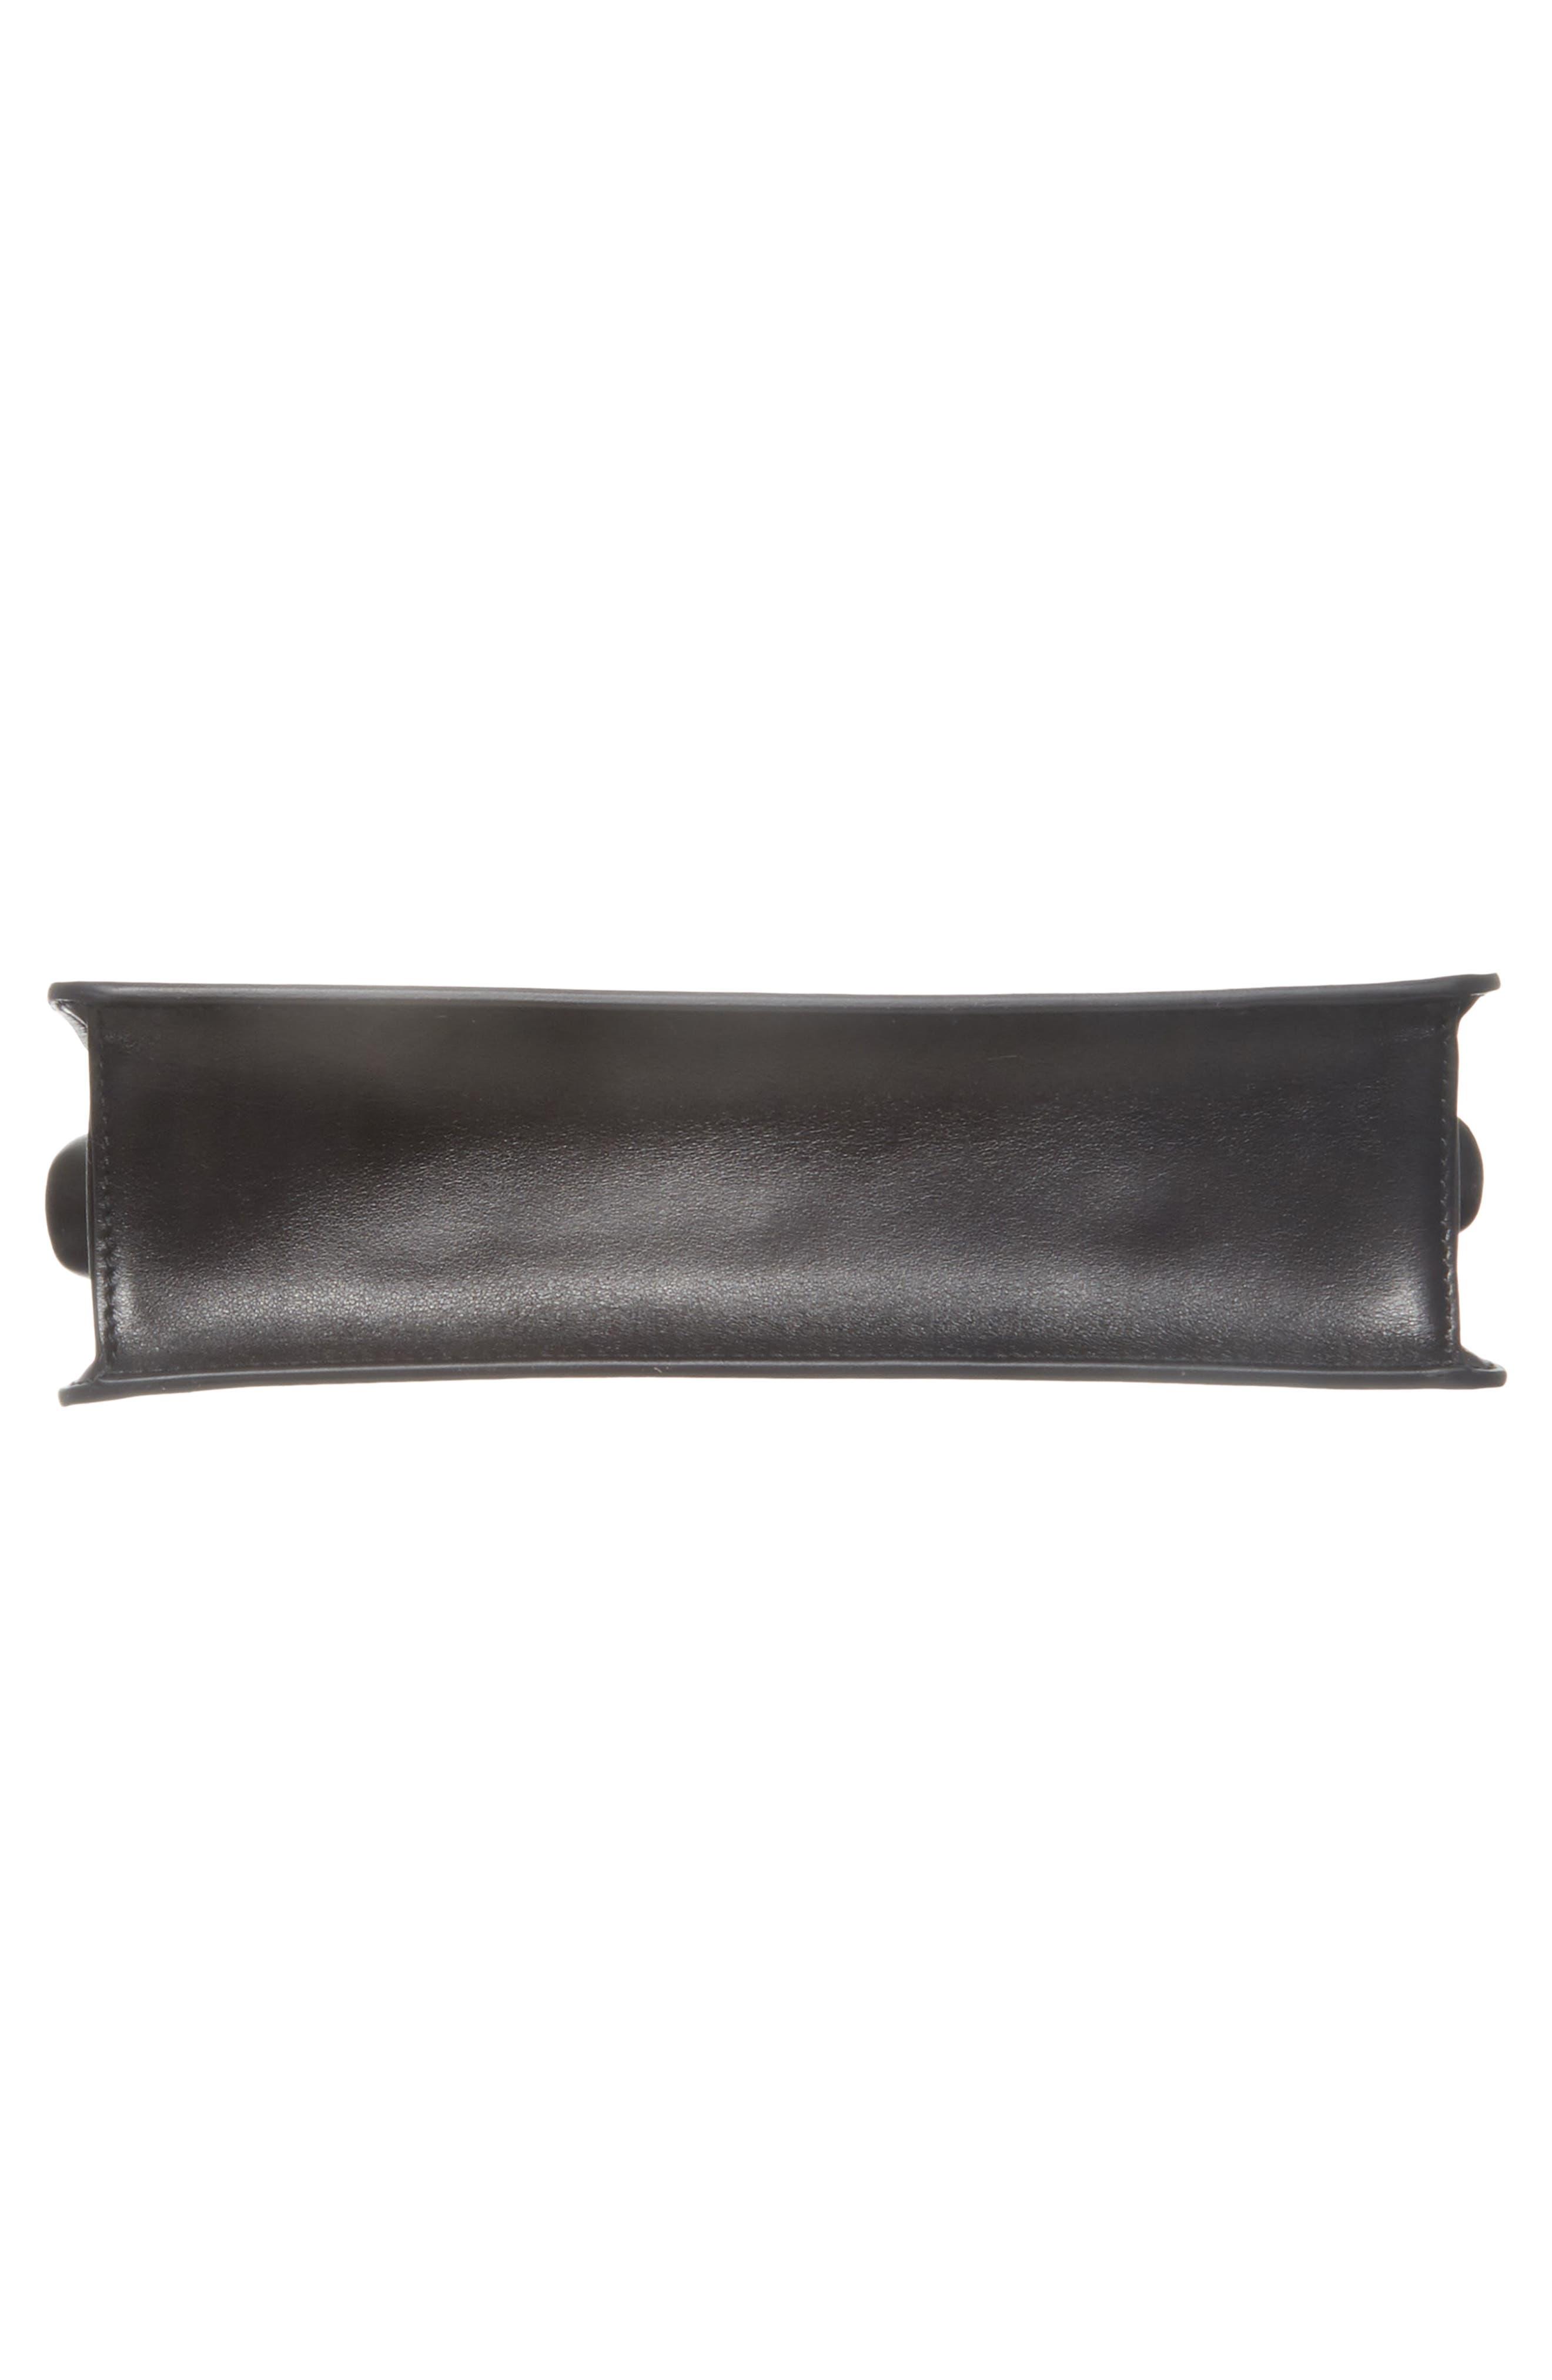 PRADA,                             Spazzolato Calfskin Crossbody Bag,                             Alternate thumbnail 7, color,                             001